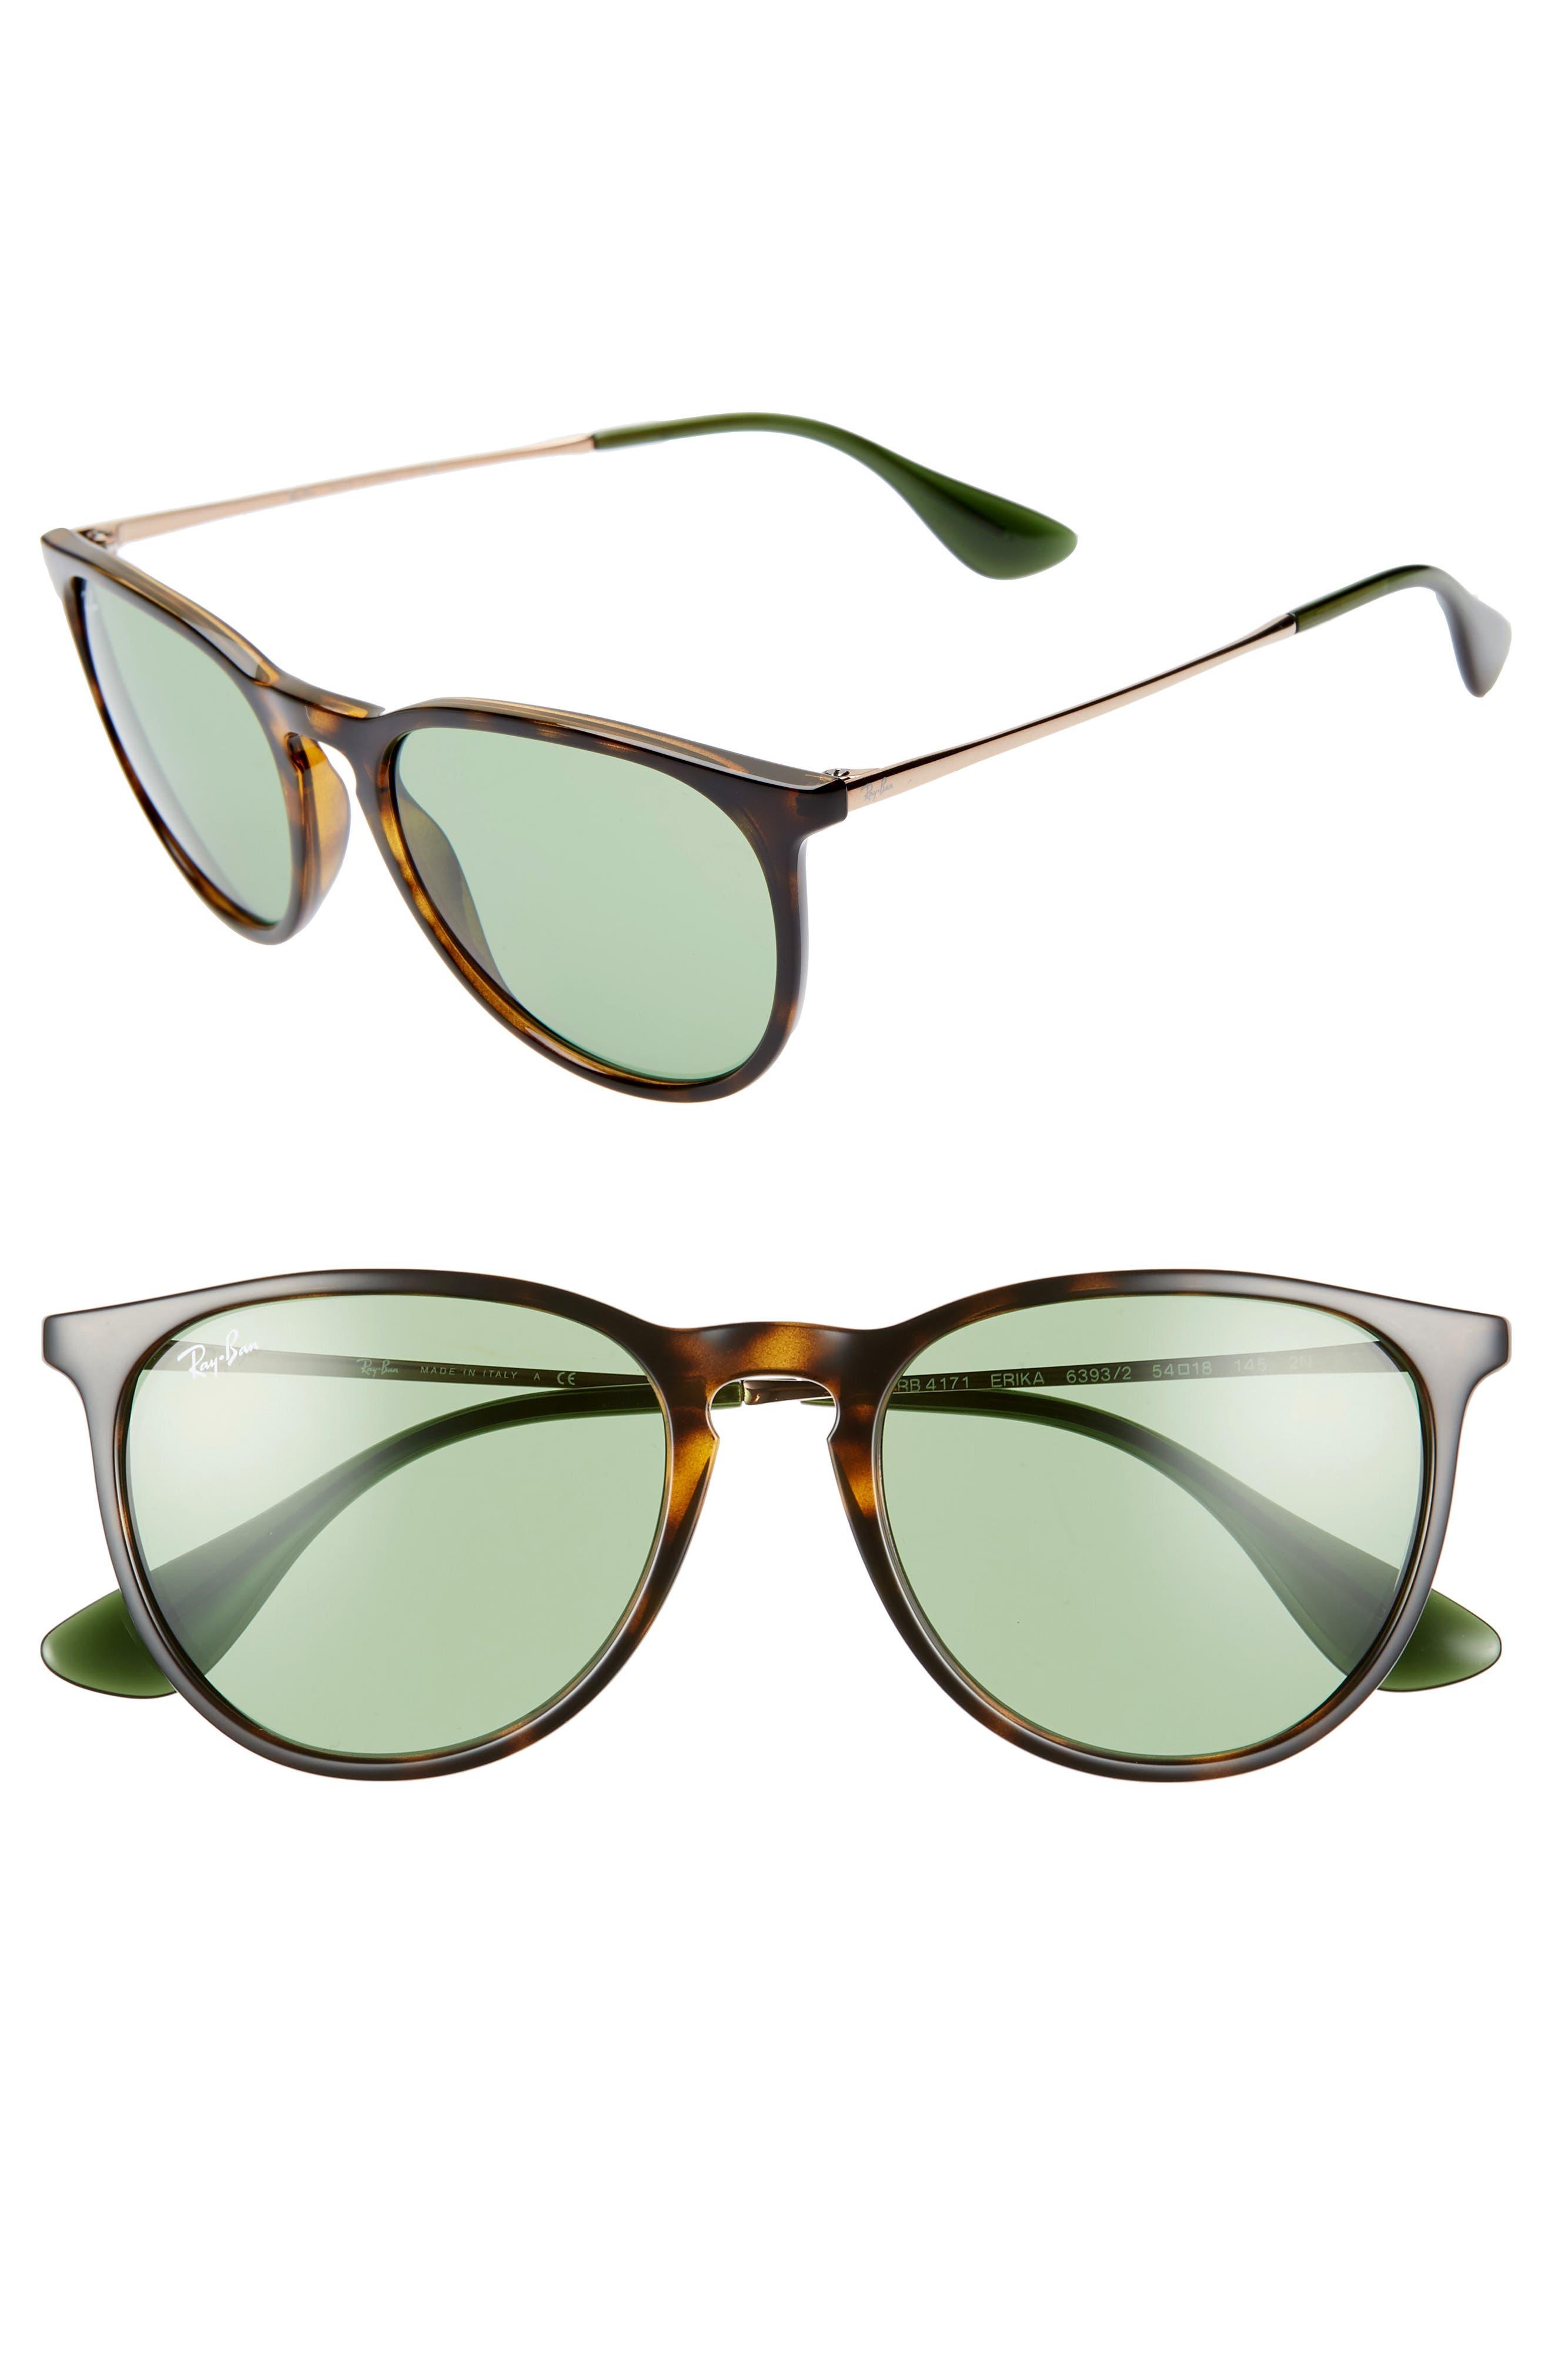 Ray-Ban Erika Classic 5m Sunglasses - Havana/ Green Solid